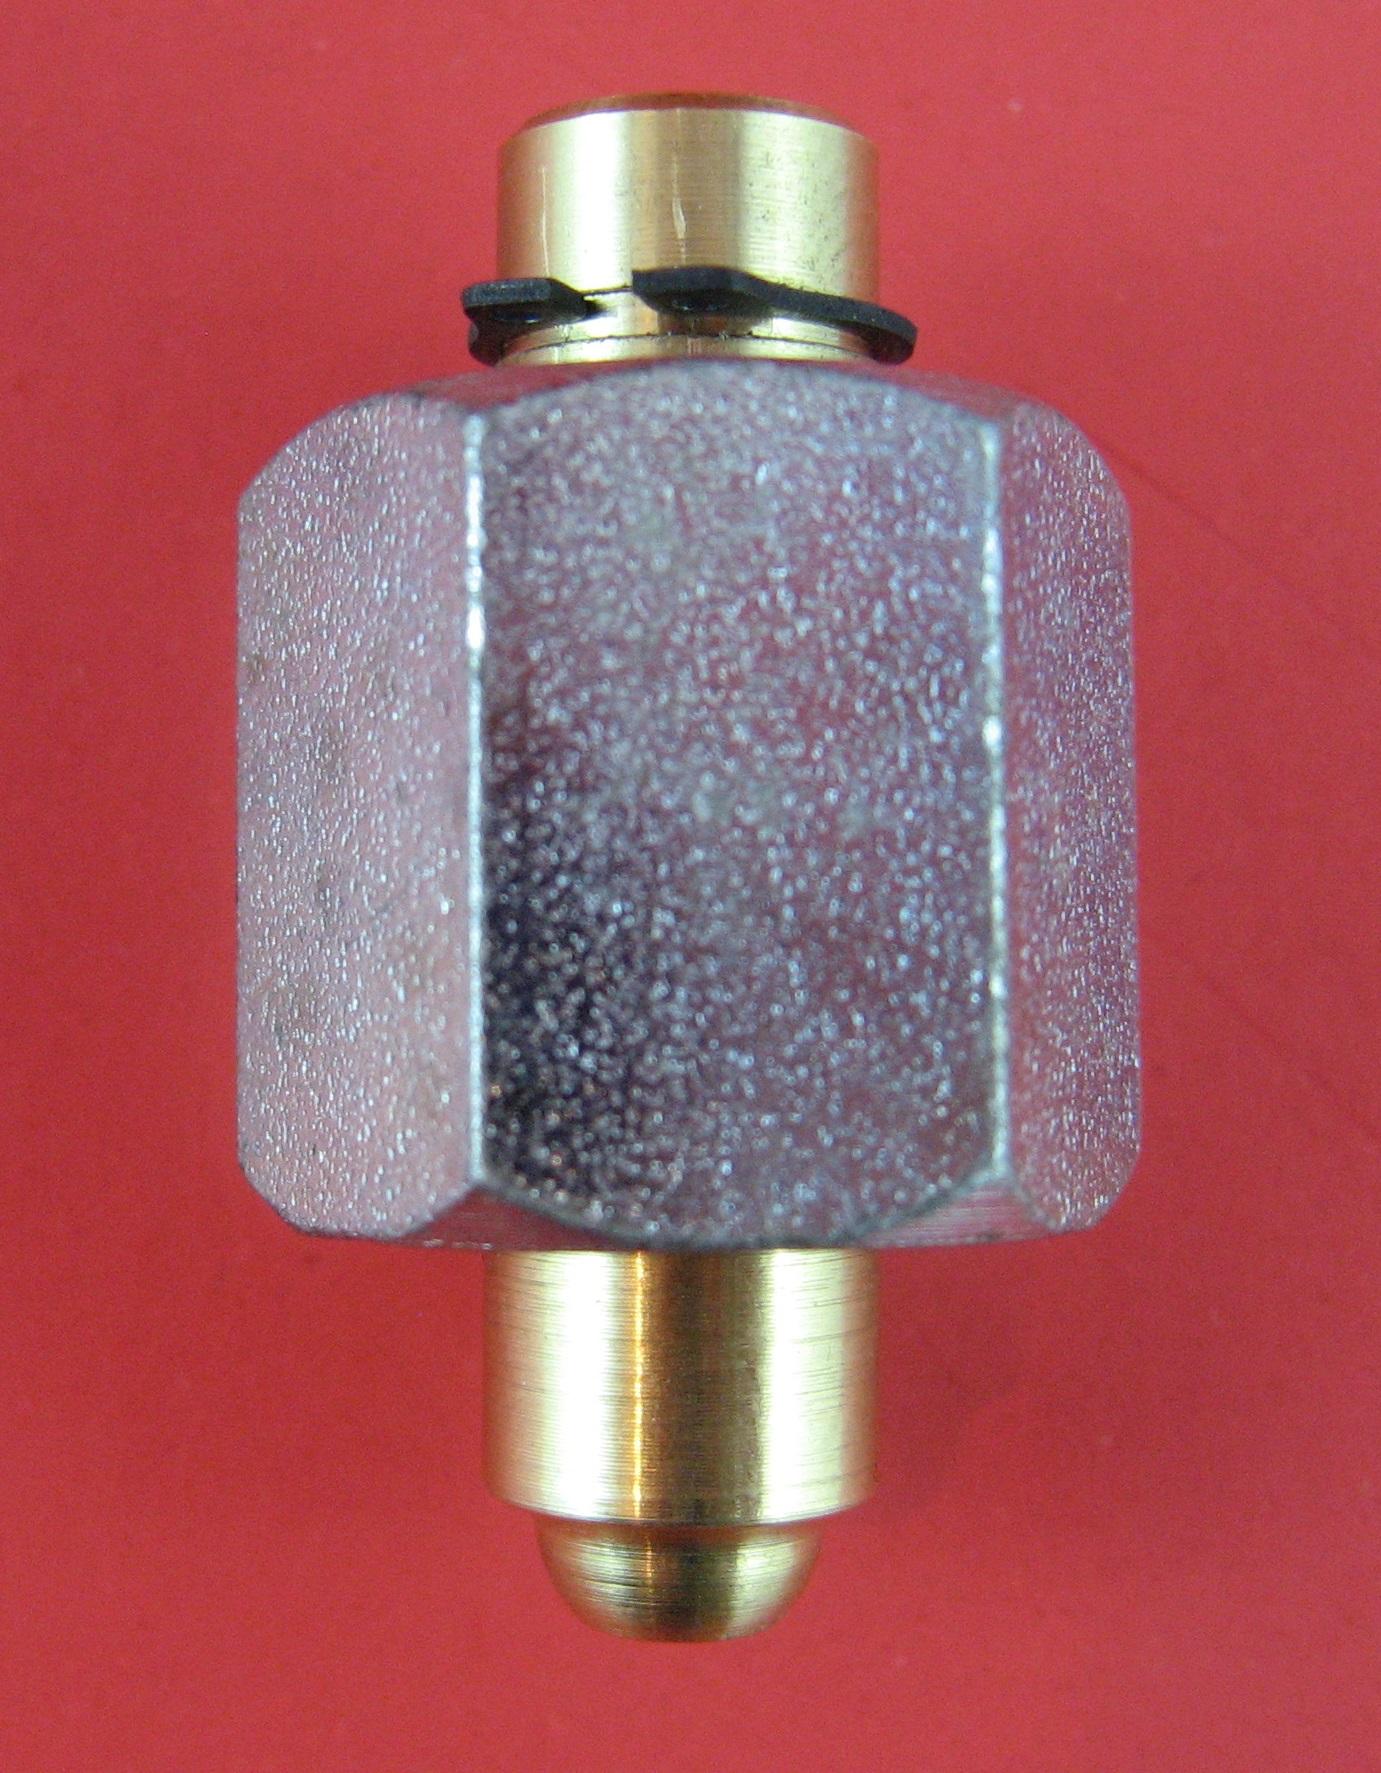 AccurateDiesel Duramax Diesel Injector Block-Off Tool//Cap 2011-2016 fits LML and LGH Set of 8